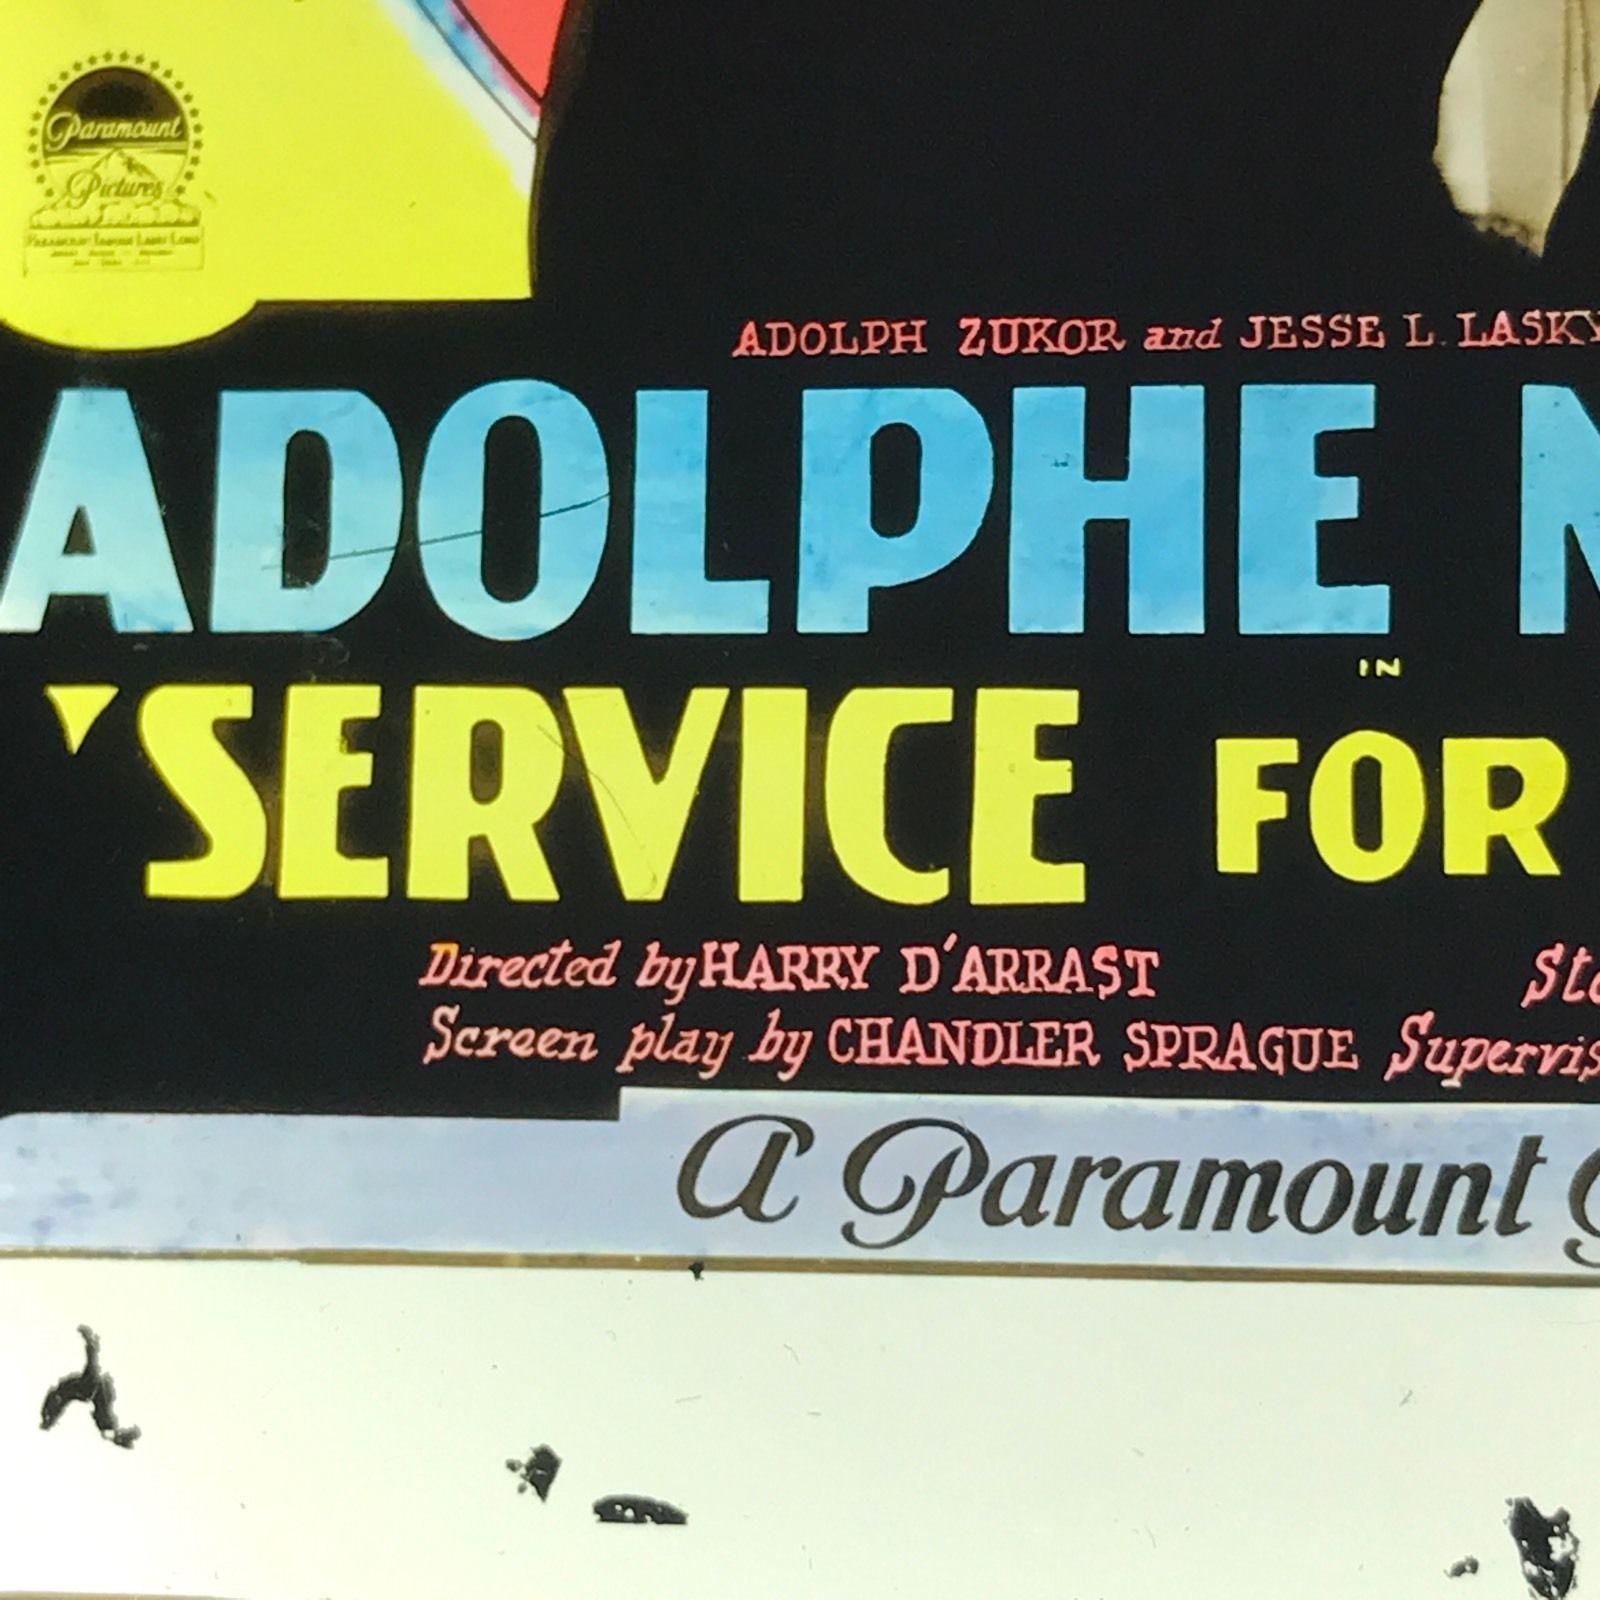 Vtg Magic Lantern Glass Movie Slide Adolphe Menjou Service For Ladies Paramount